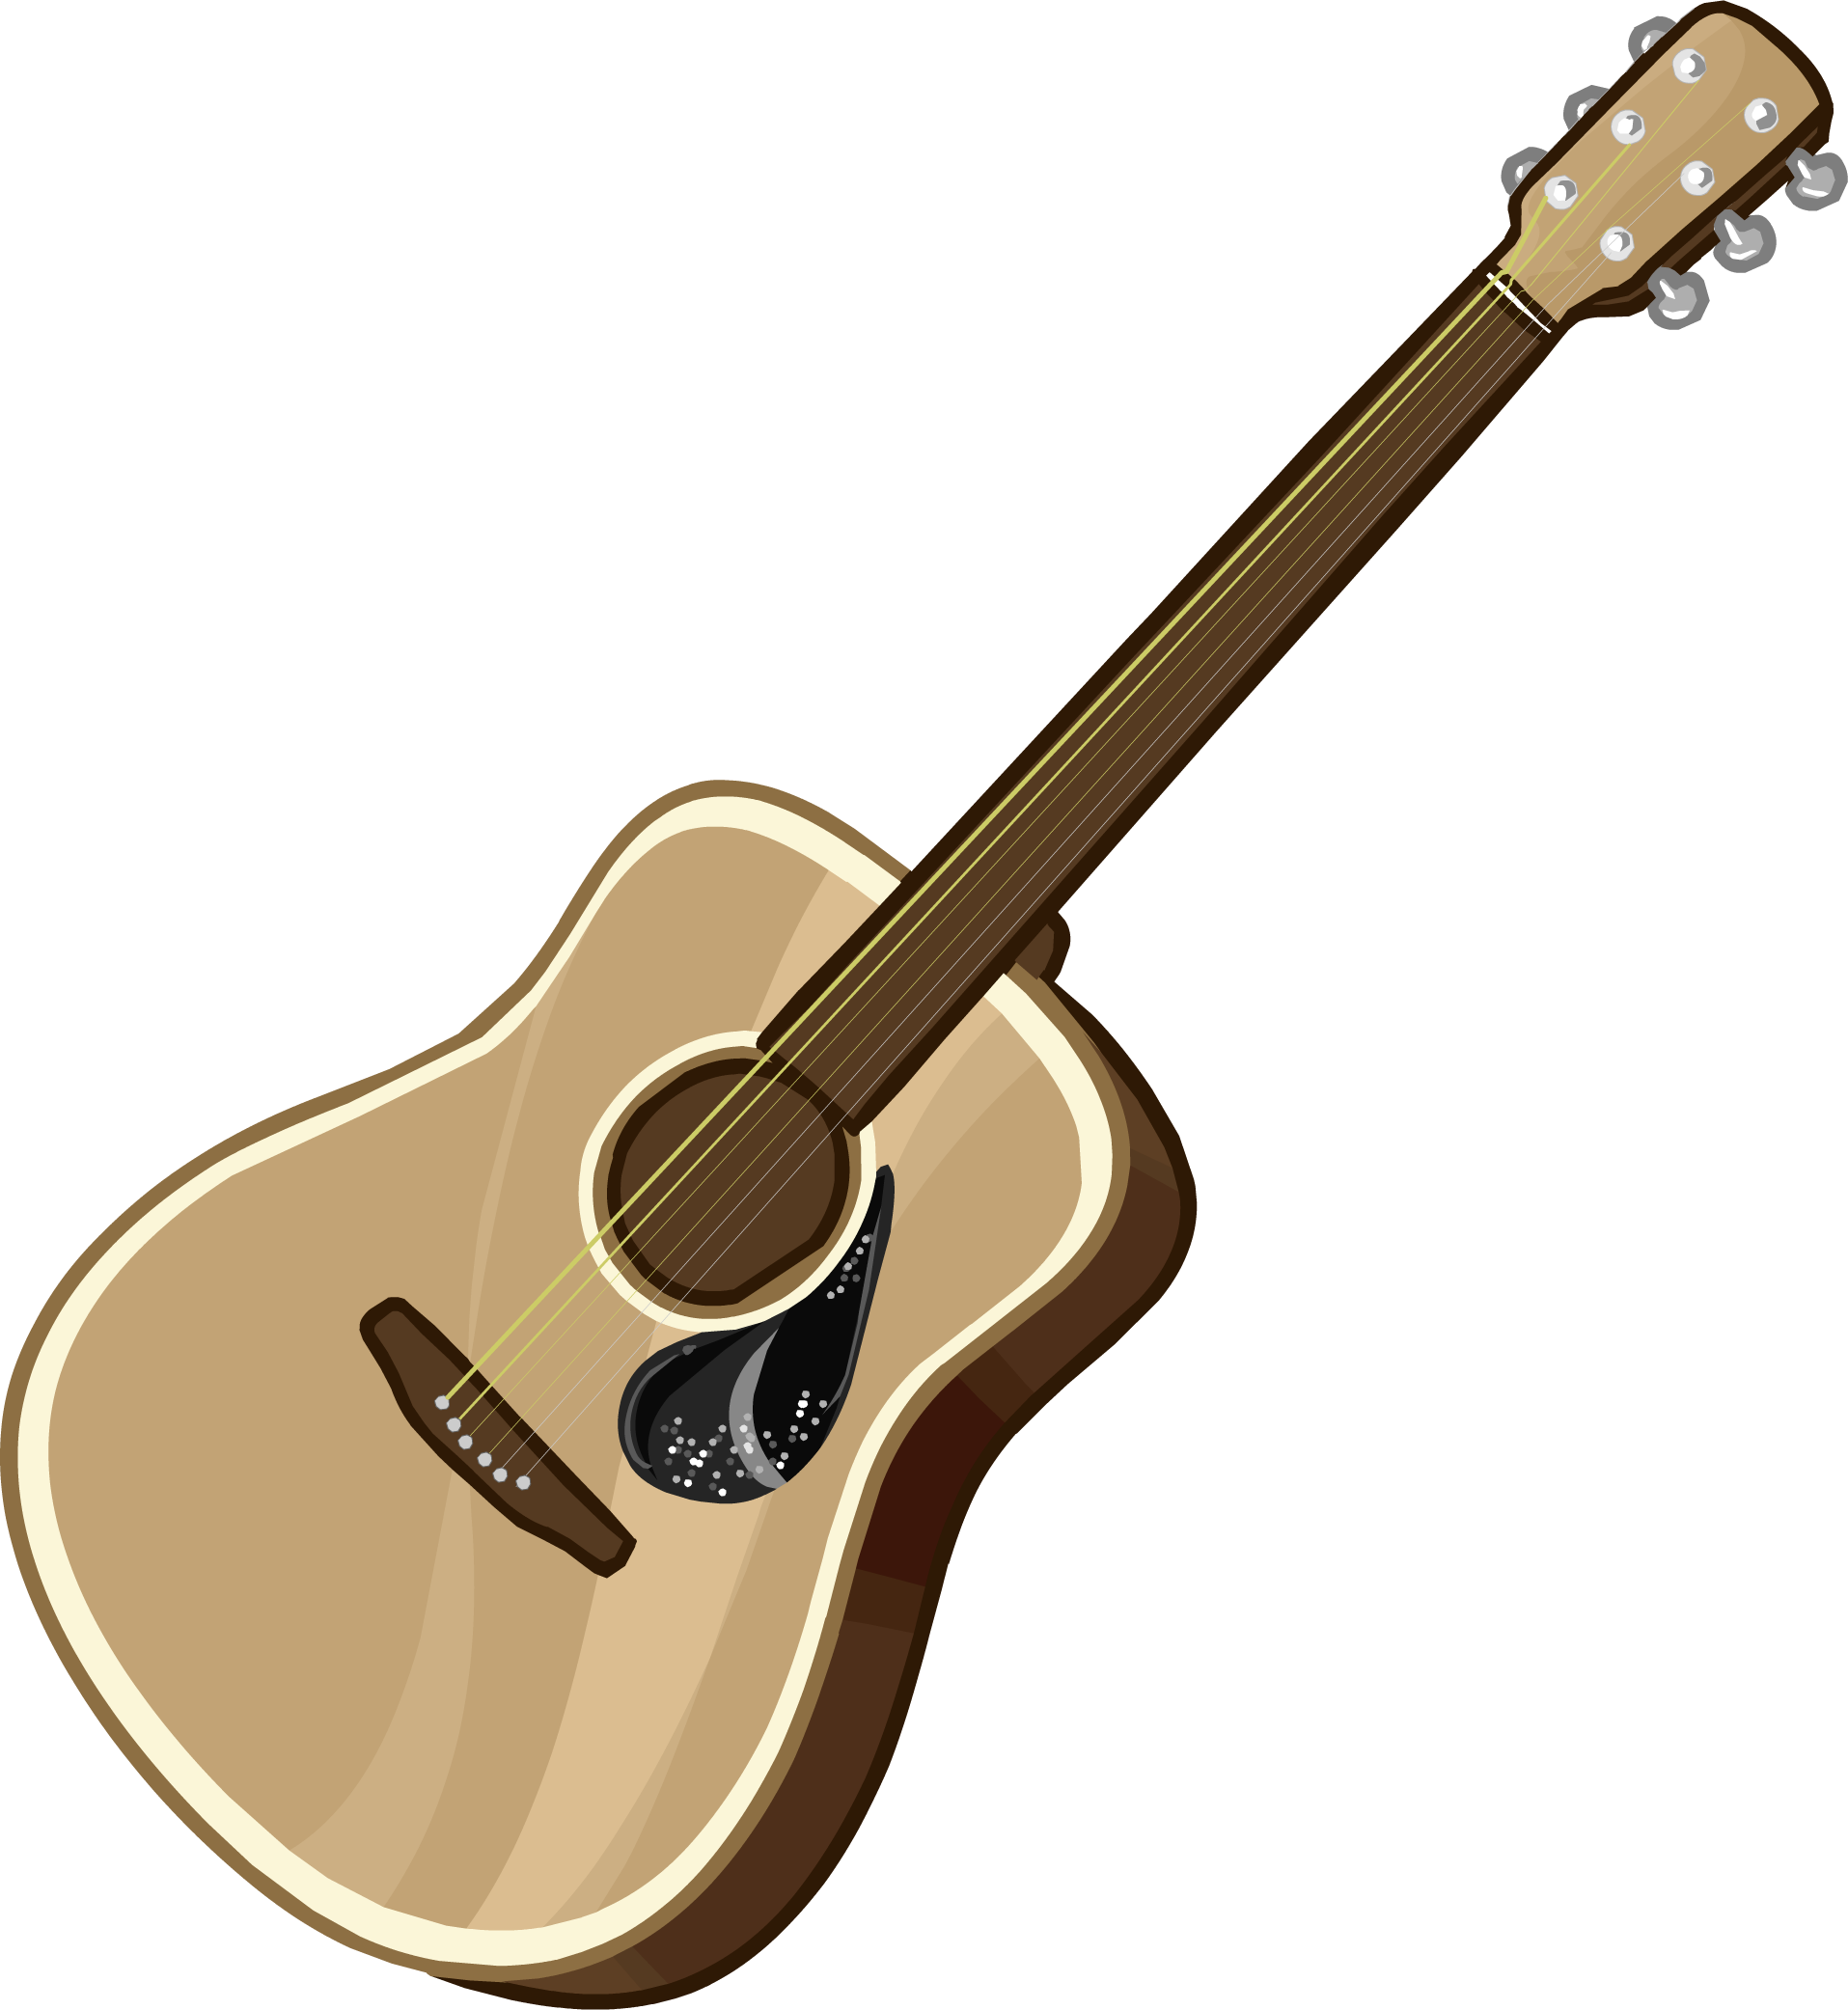 Girl next door club. Clipart guitar guitar spain